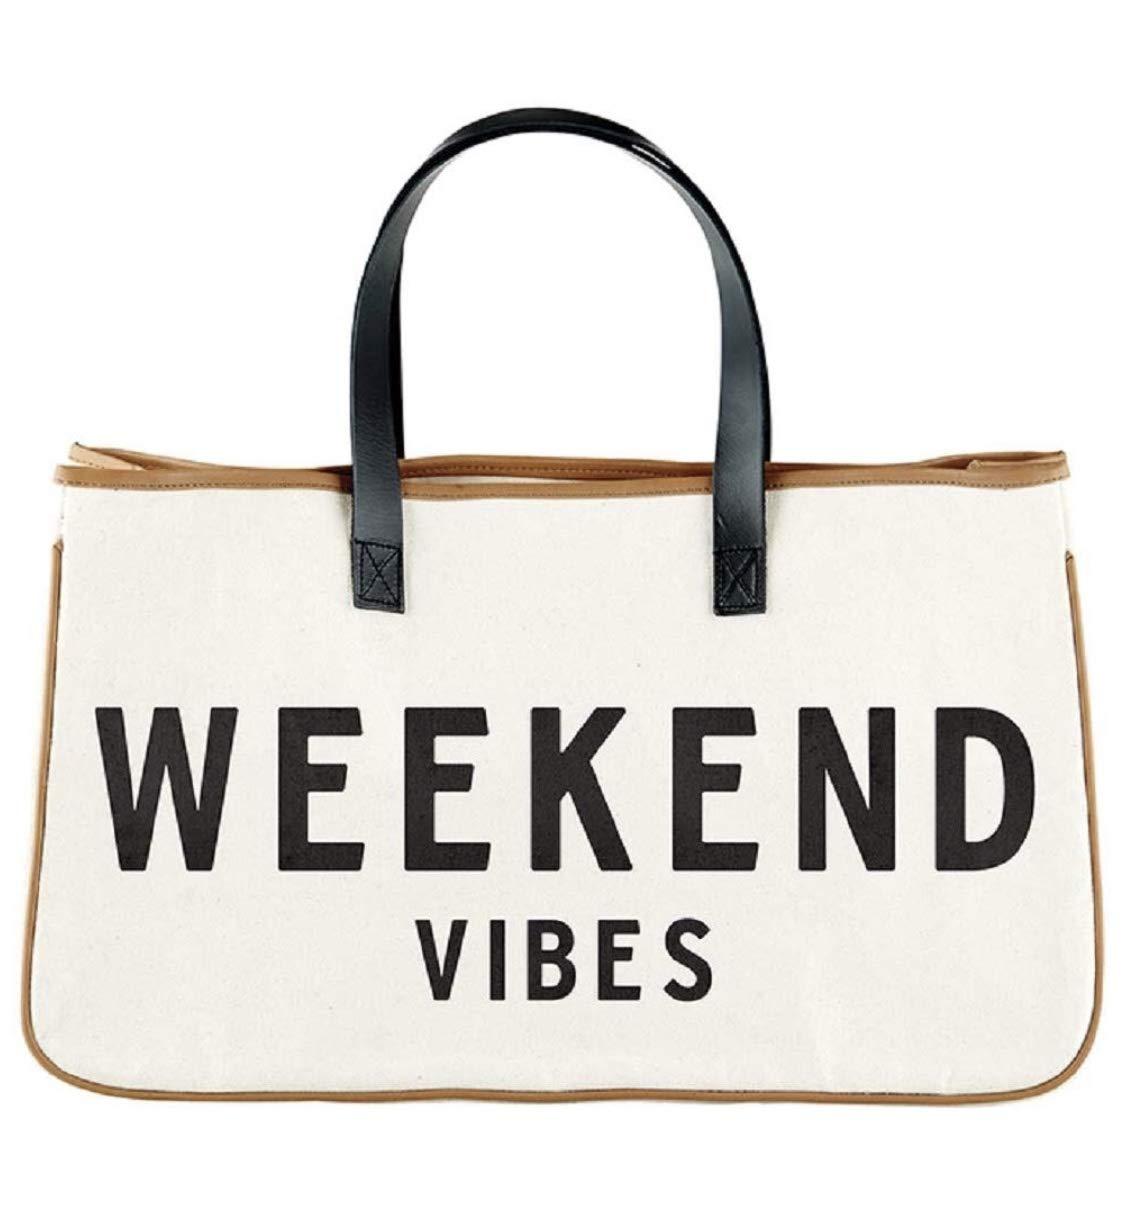 Weekend Vibes Canvas Tote Bag, Beach Bag, Beach Tote, Carry Bag by Santa Barbara Design Studio (Weekend Vibes Black and White) by Santa Barbara Designs